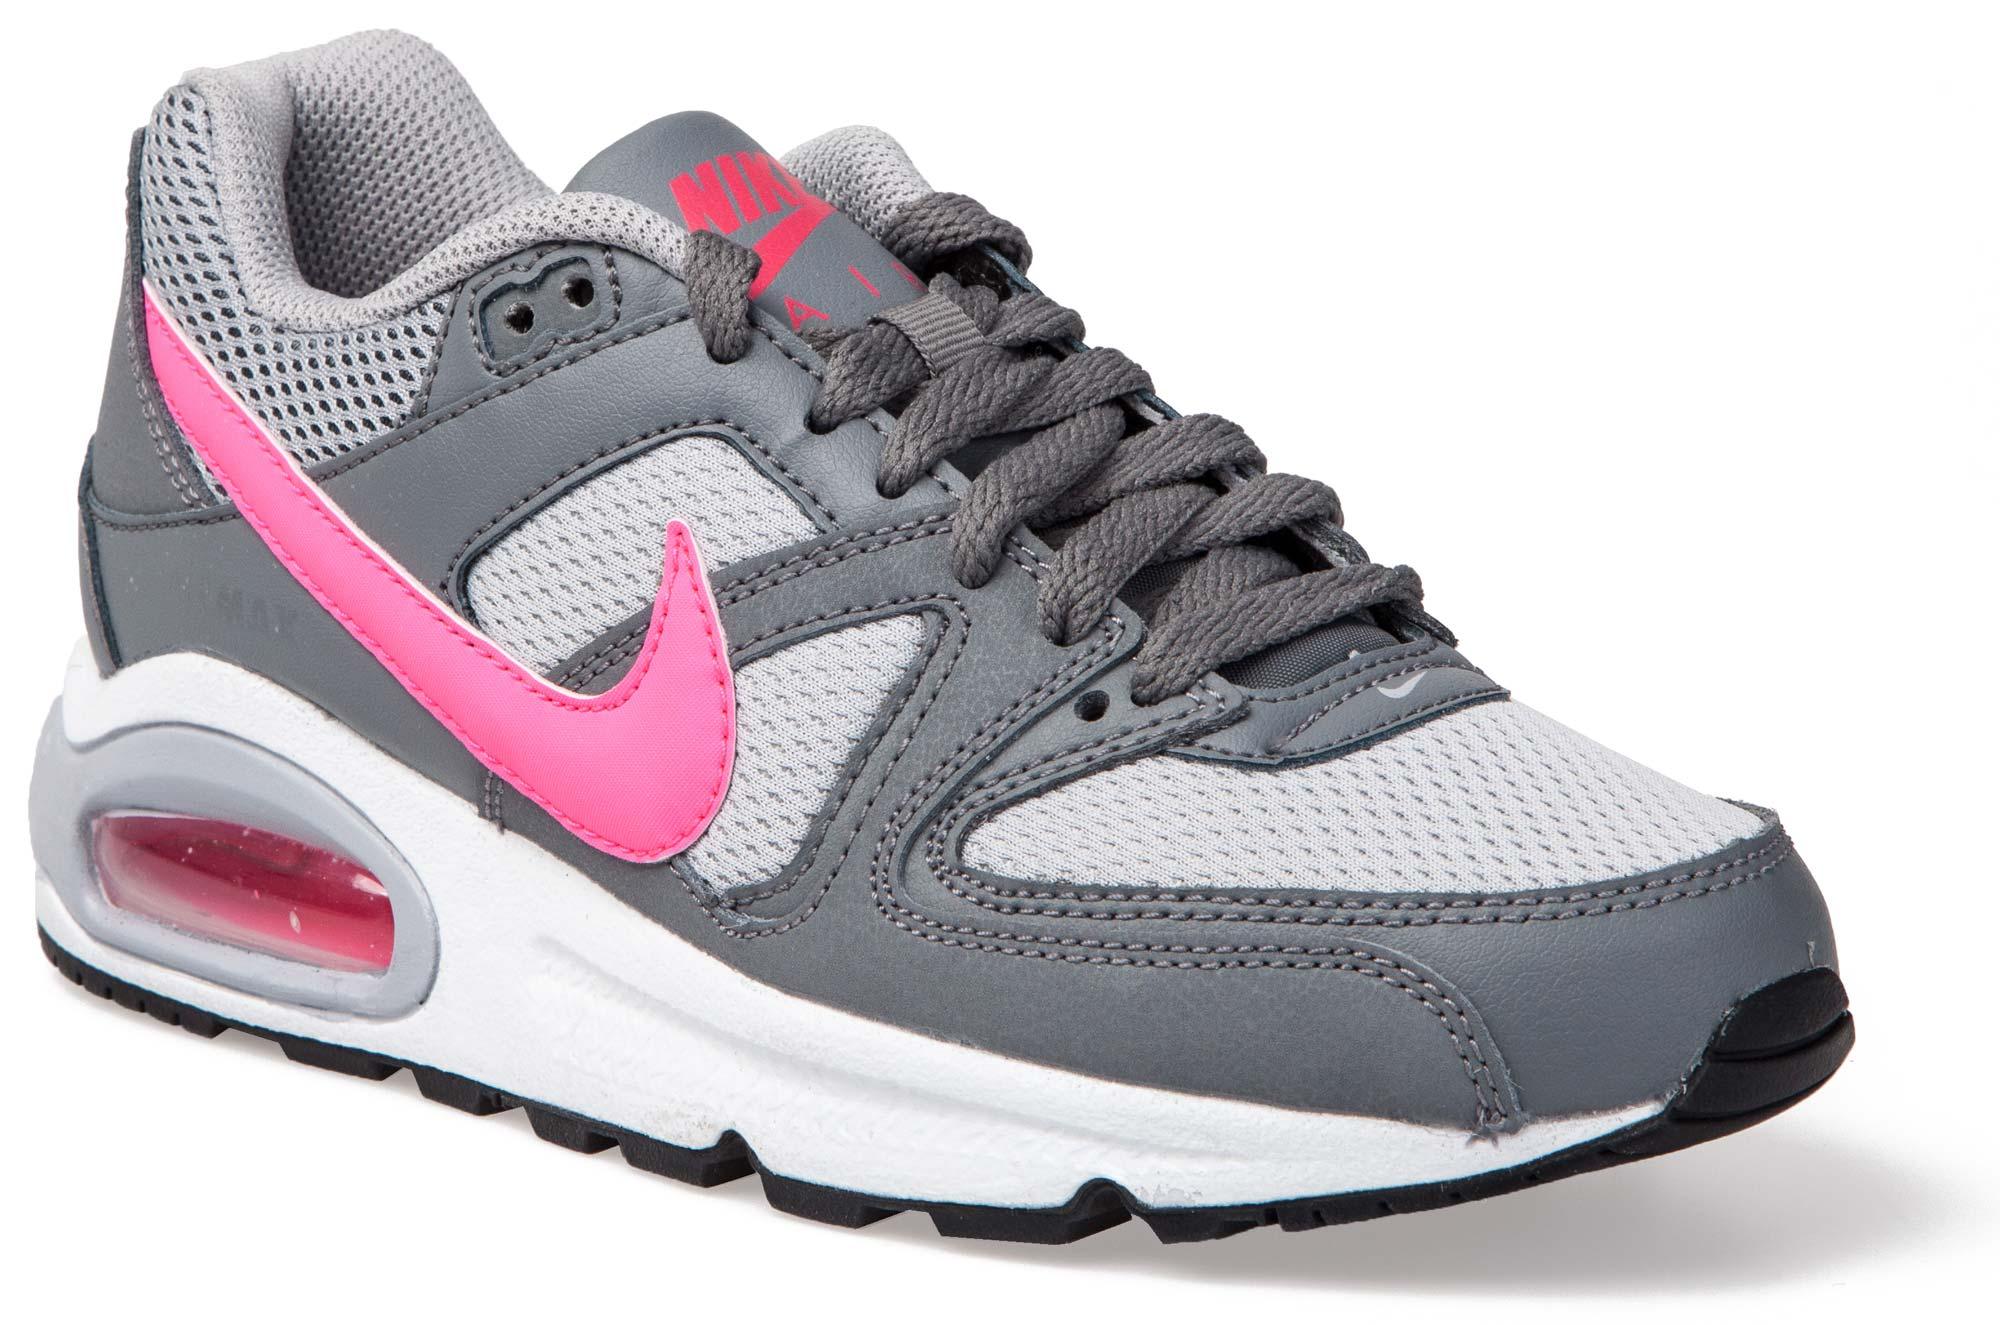 buy popular 0ea66 c3535 Girls  Leisure Shoe  Nike AIR MAX COMMAND (GS). Girls  Leisure Shoe